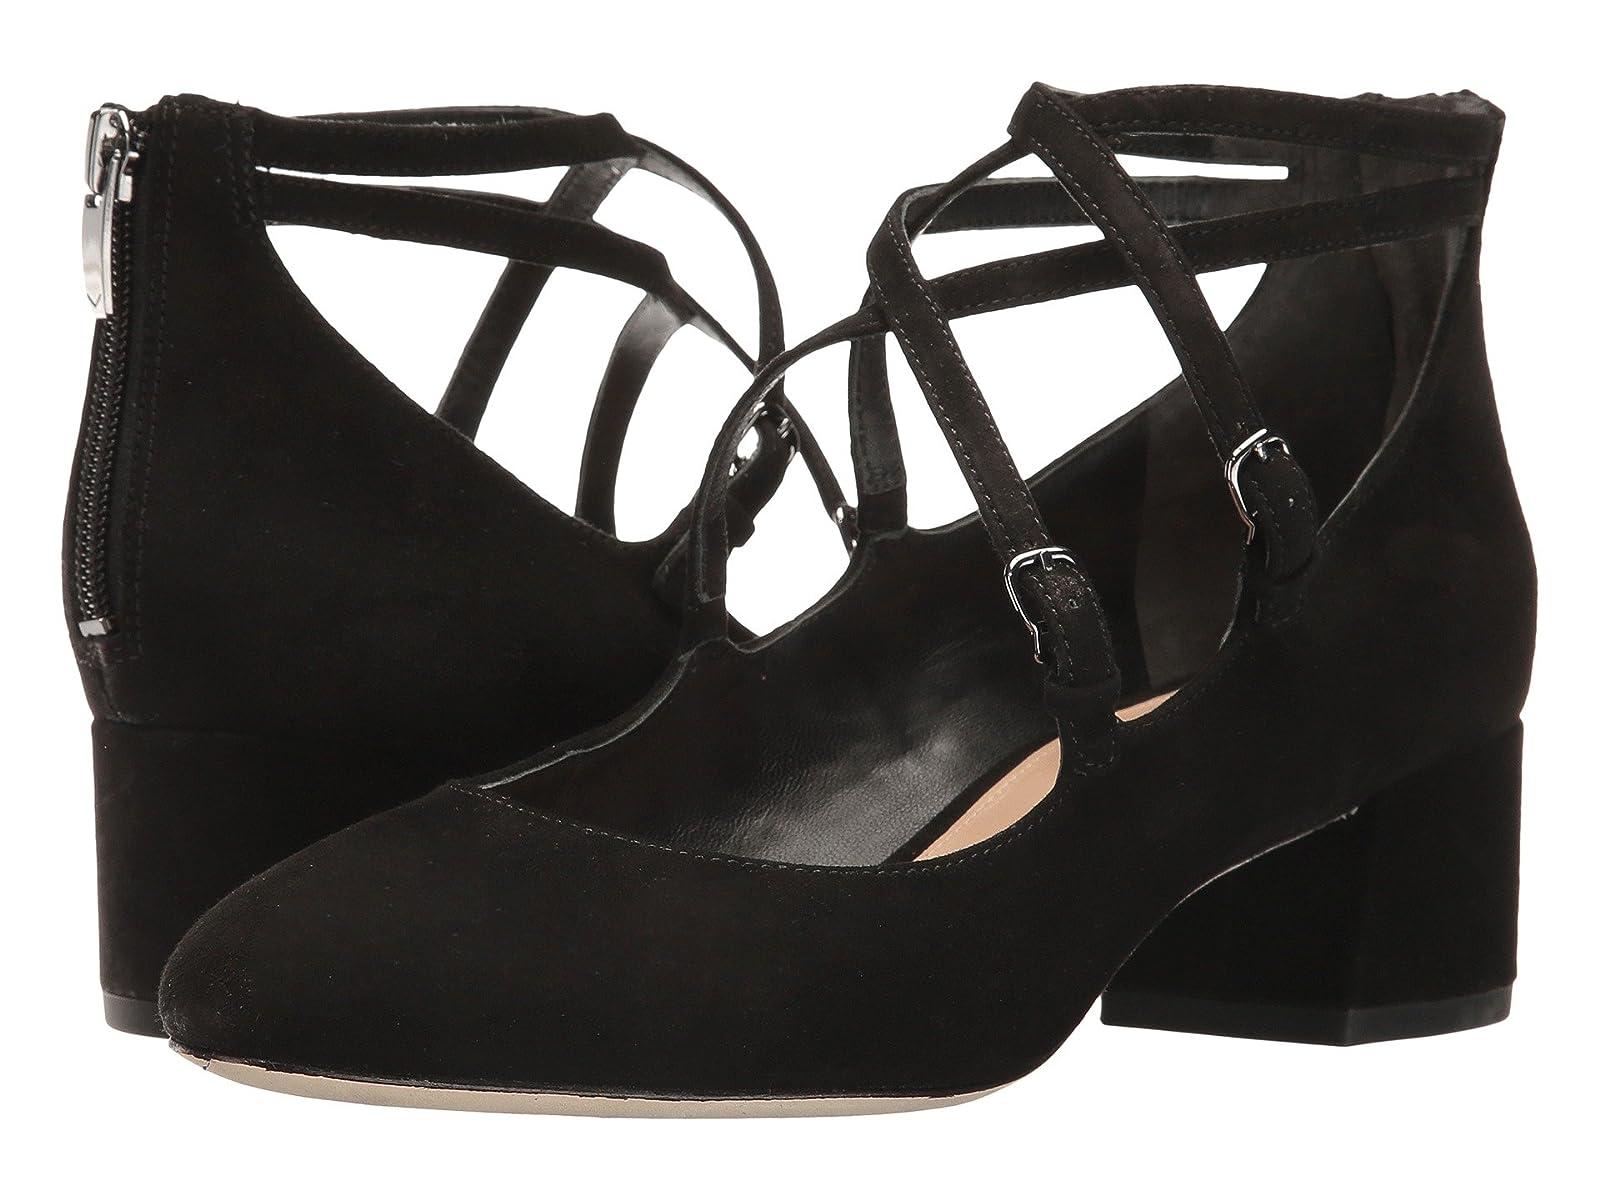 Via Spiga AdonnaCheap and distinctive eye-catching shoes